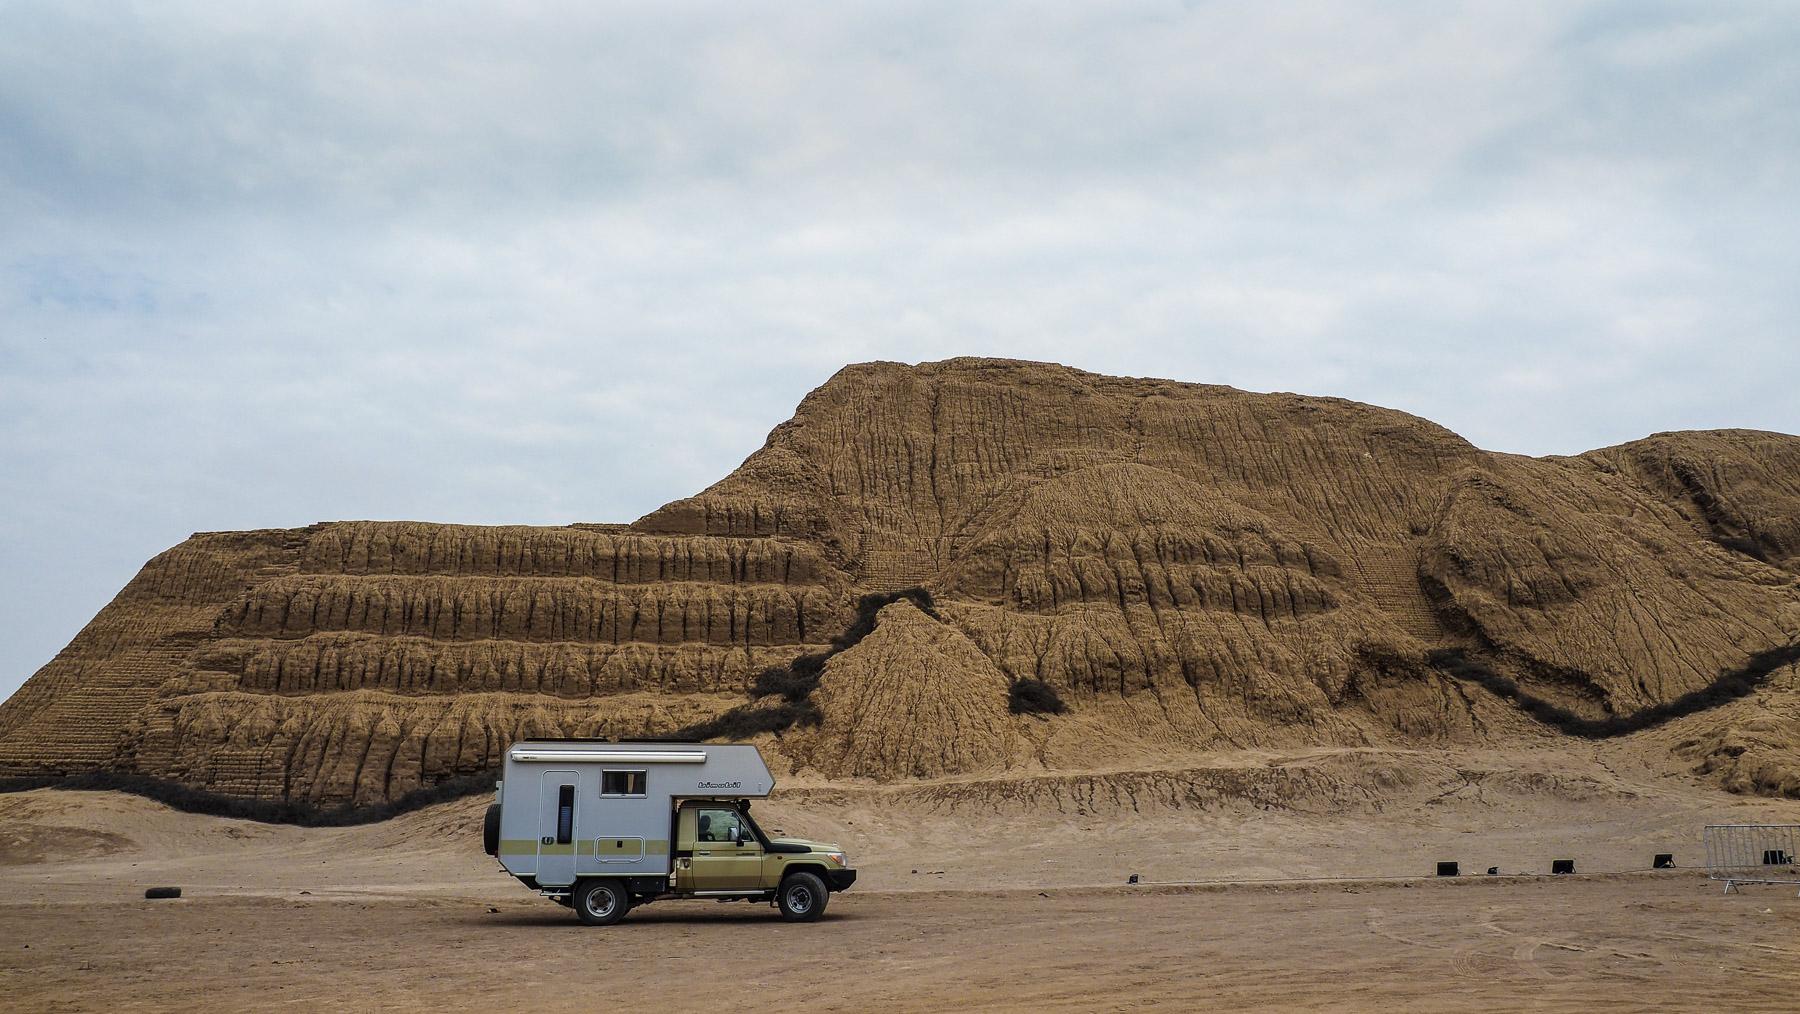 Adobe-Pyramide Huaca del Sol -  Moche Kultur bei Trujillo